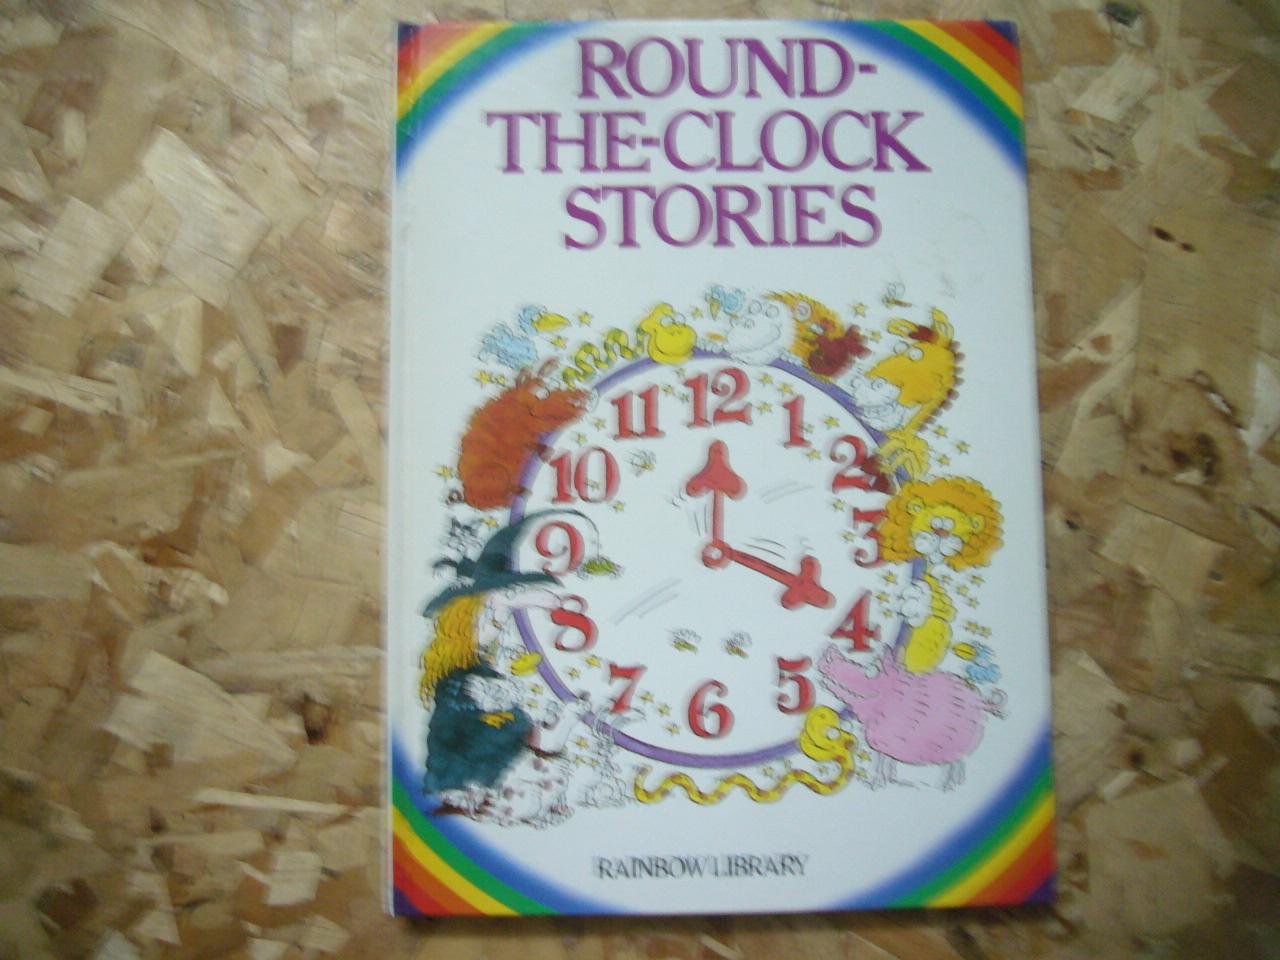 Round-the-Clock Stories